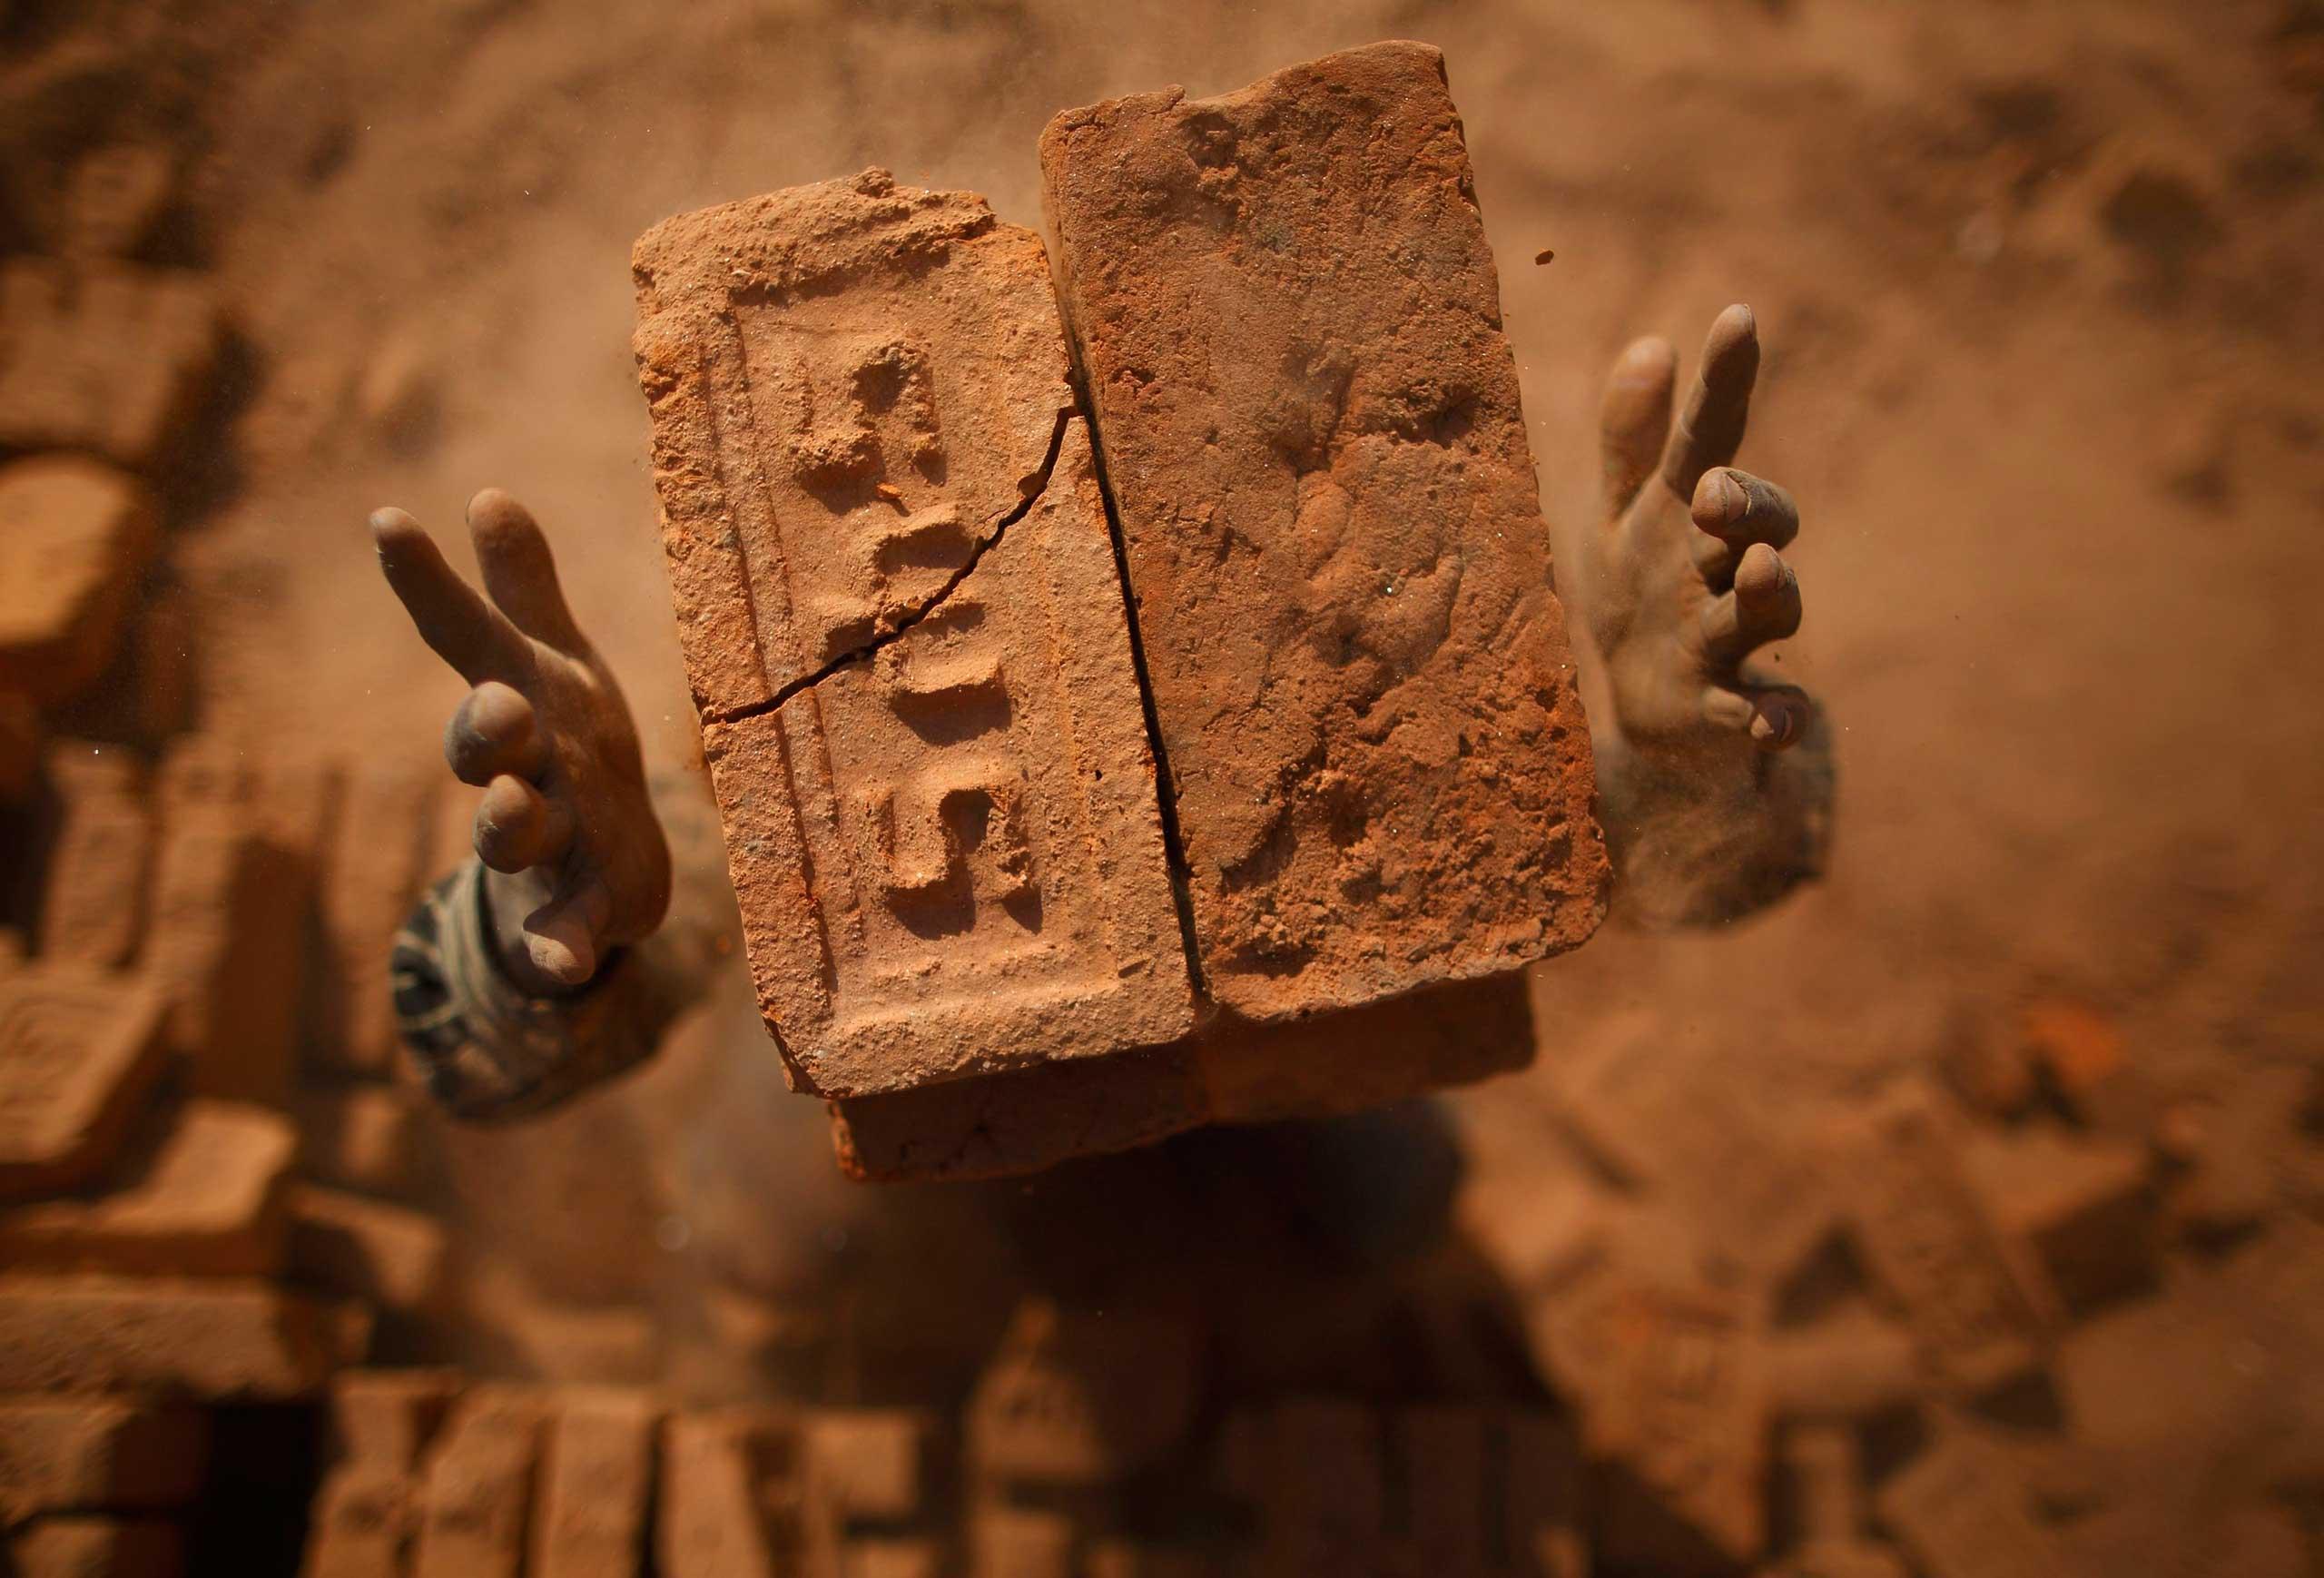 Jan. 12, 2015. A worker stacks bricks on his head at a brick factory in Lalitpur, Nepal.